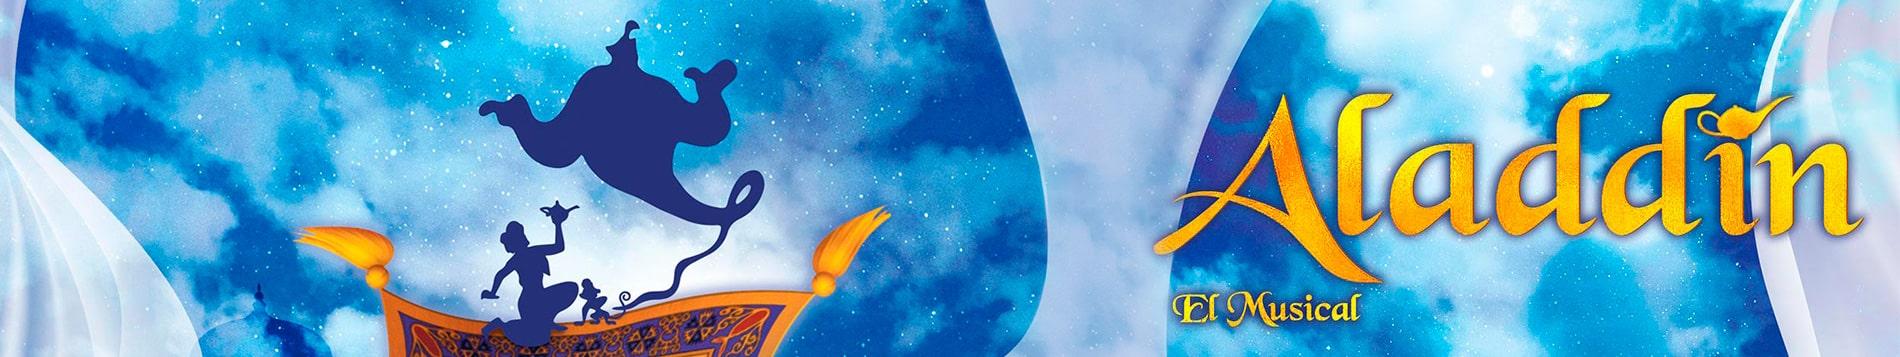 Aladdin, El Musical